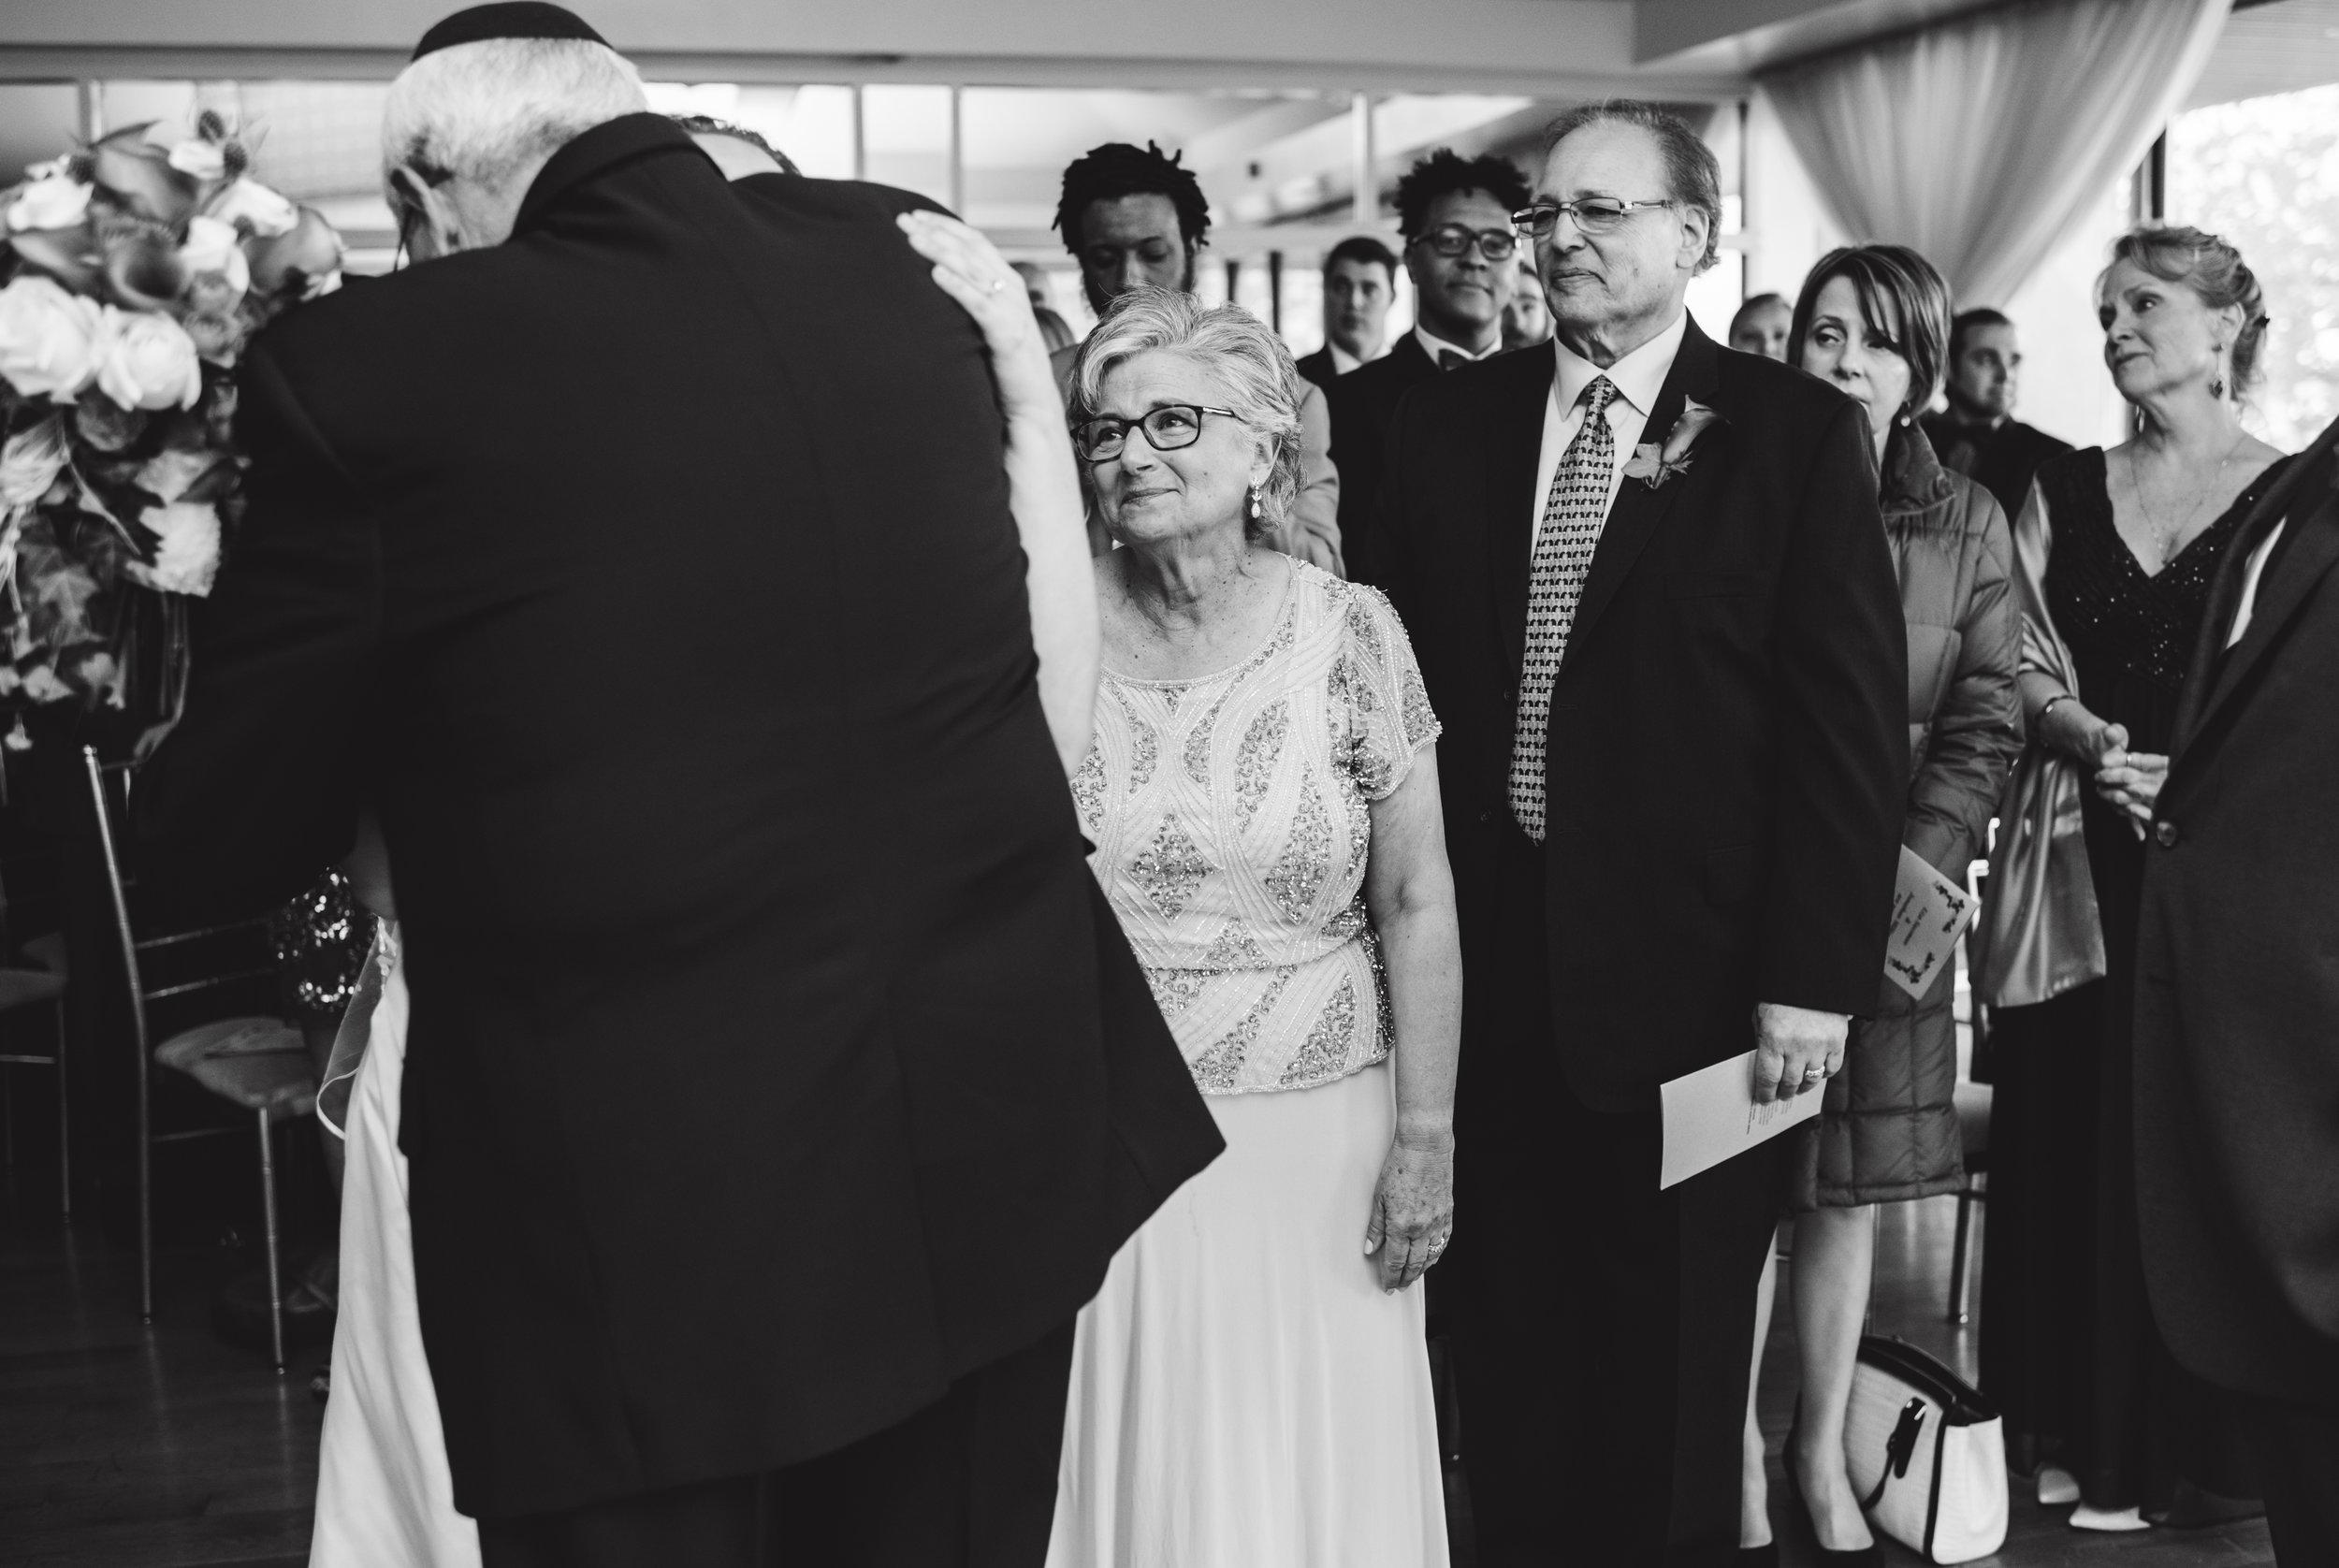 LIZA & JON - BATTERY PARK WEDDING - NYC INTIMATE WEDDING PHOTOGRAPHER - CHI-CHI AGBIM-369.jpg